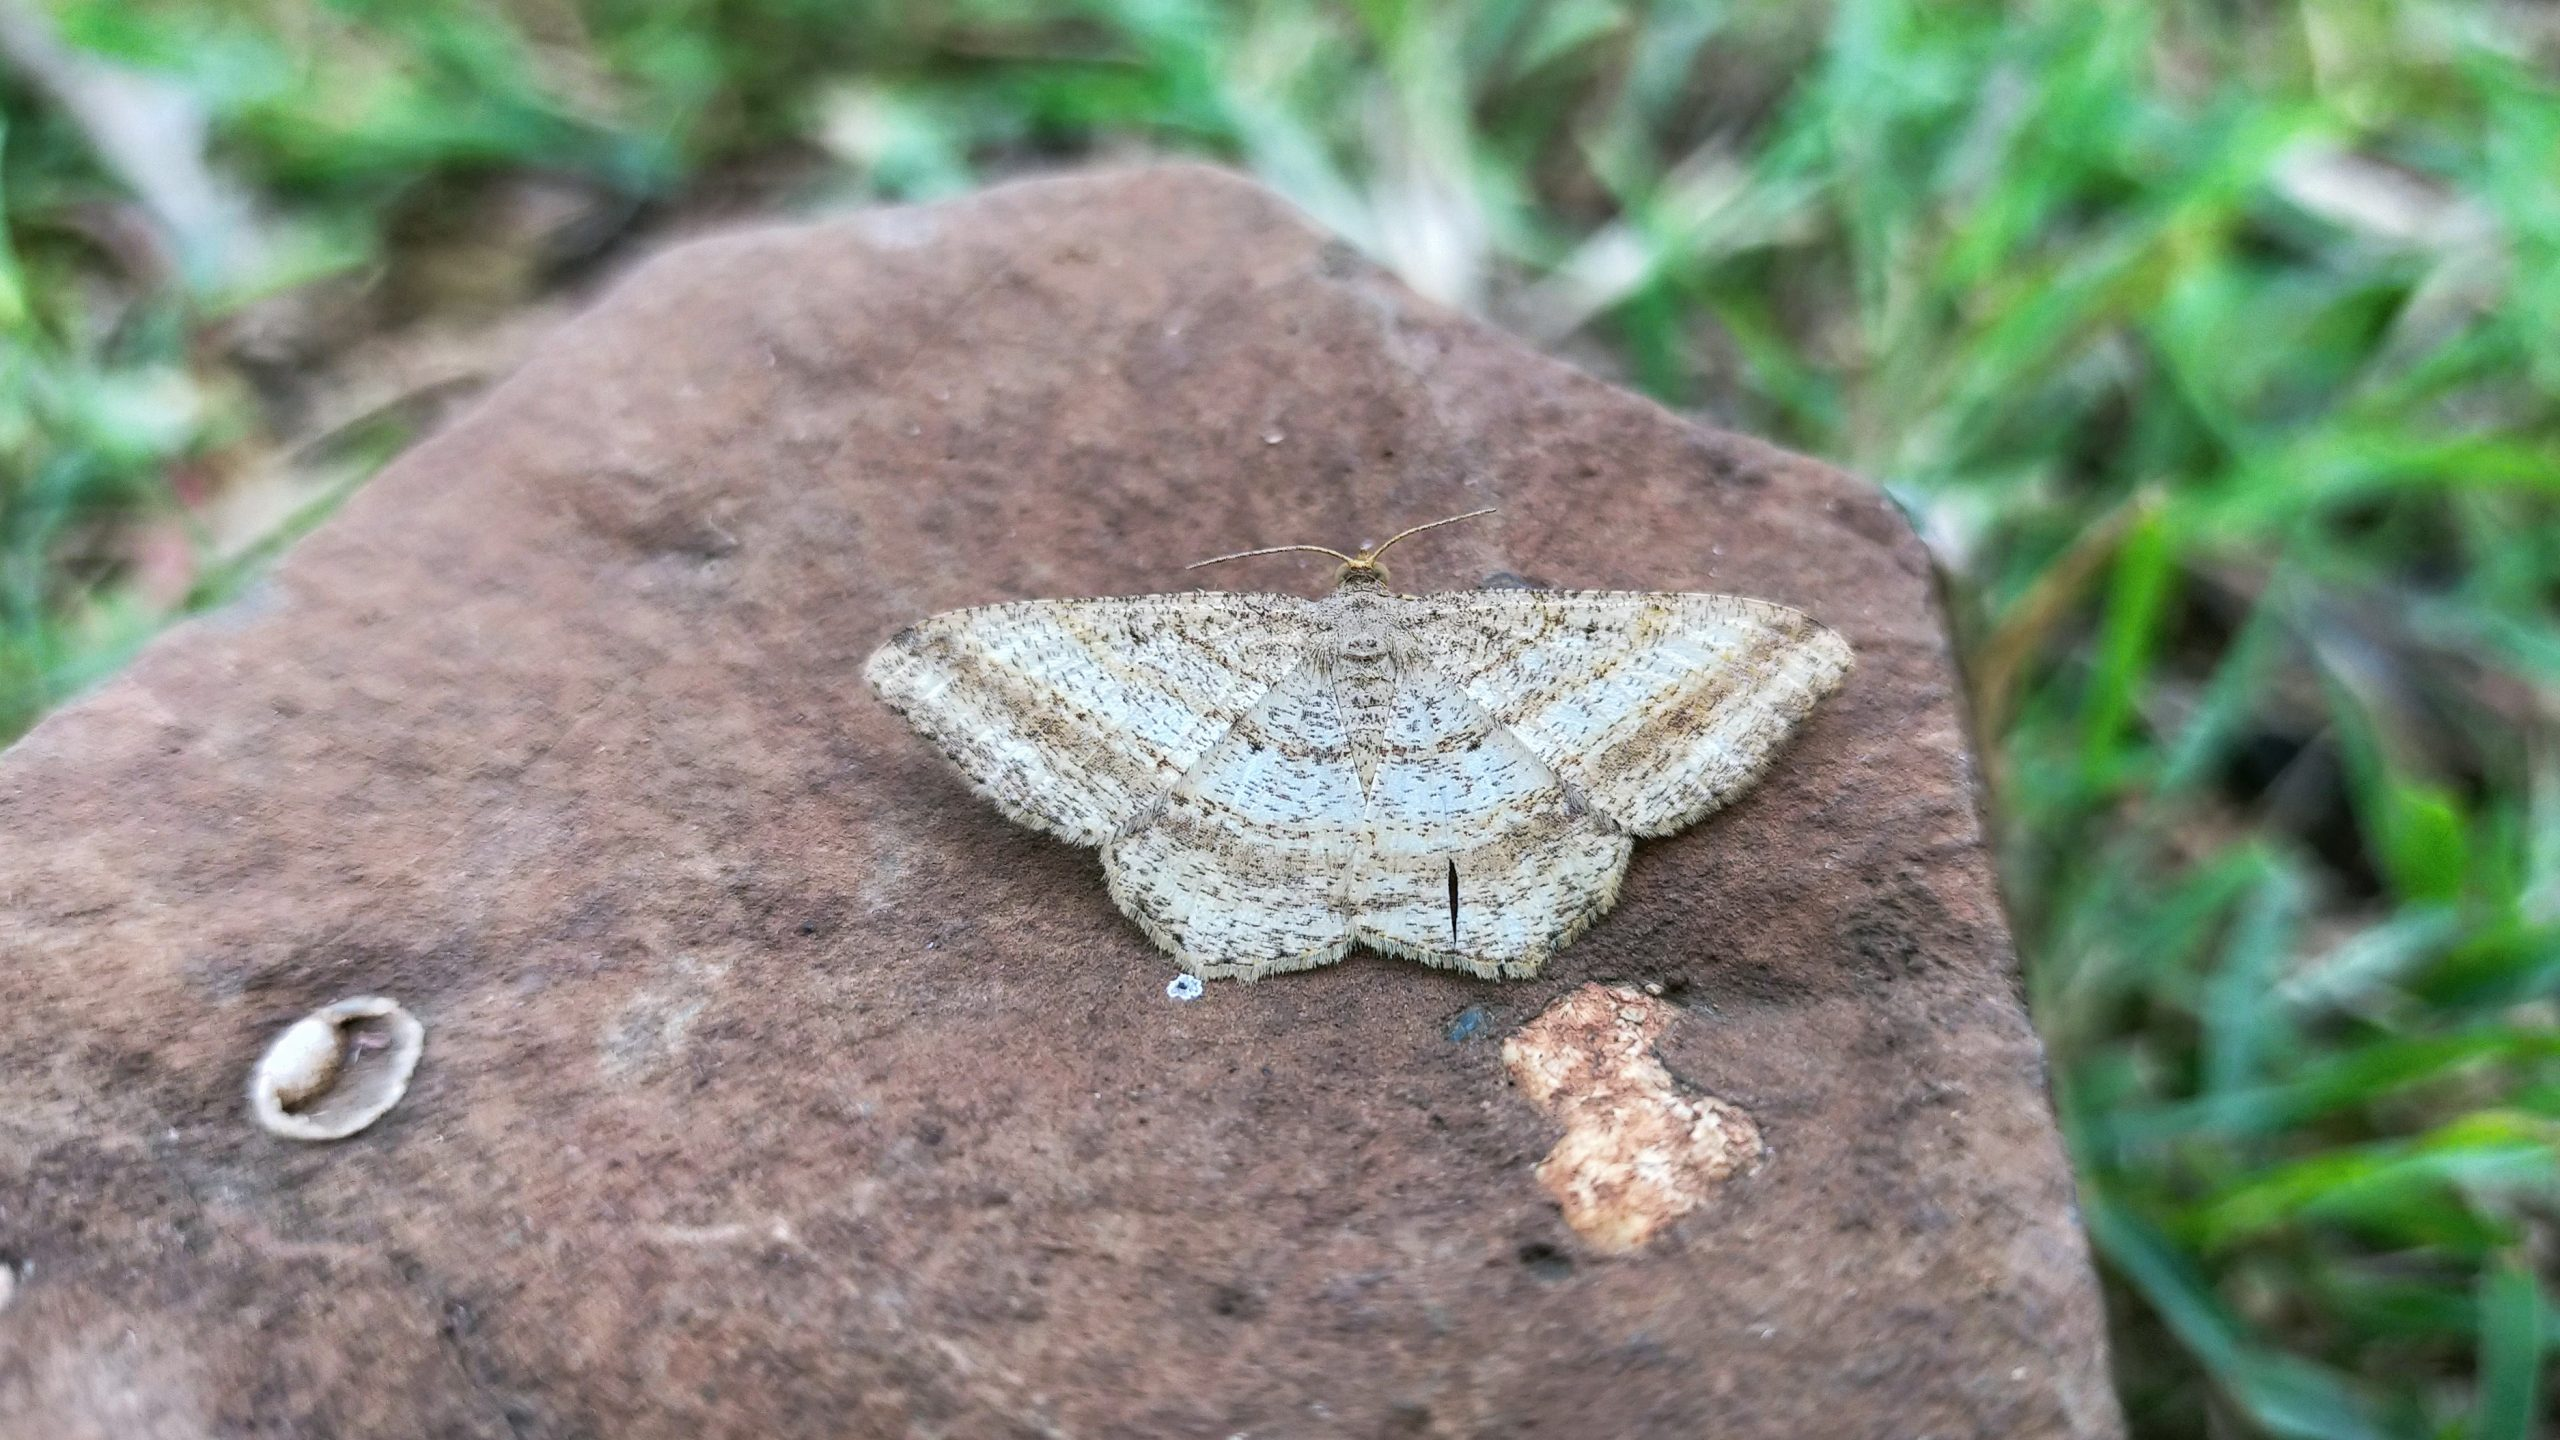 A butterfly on a rock